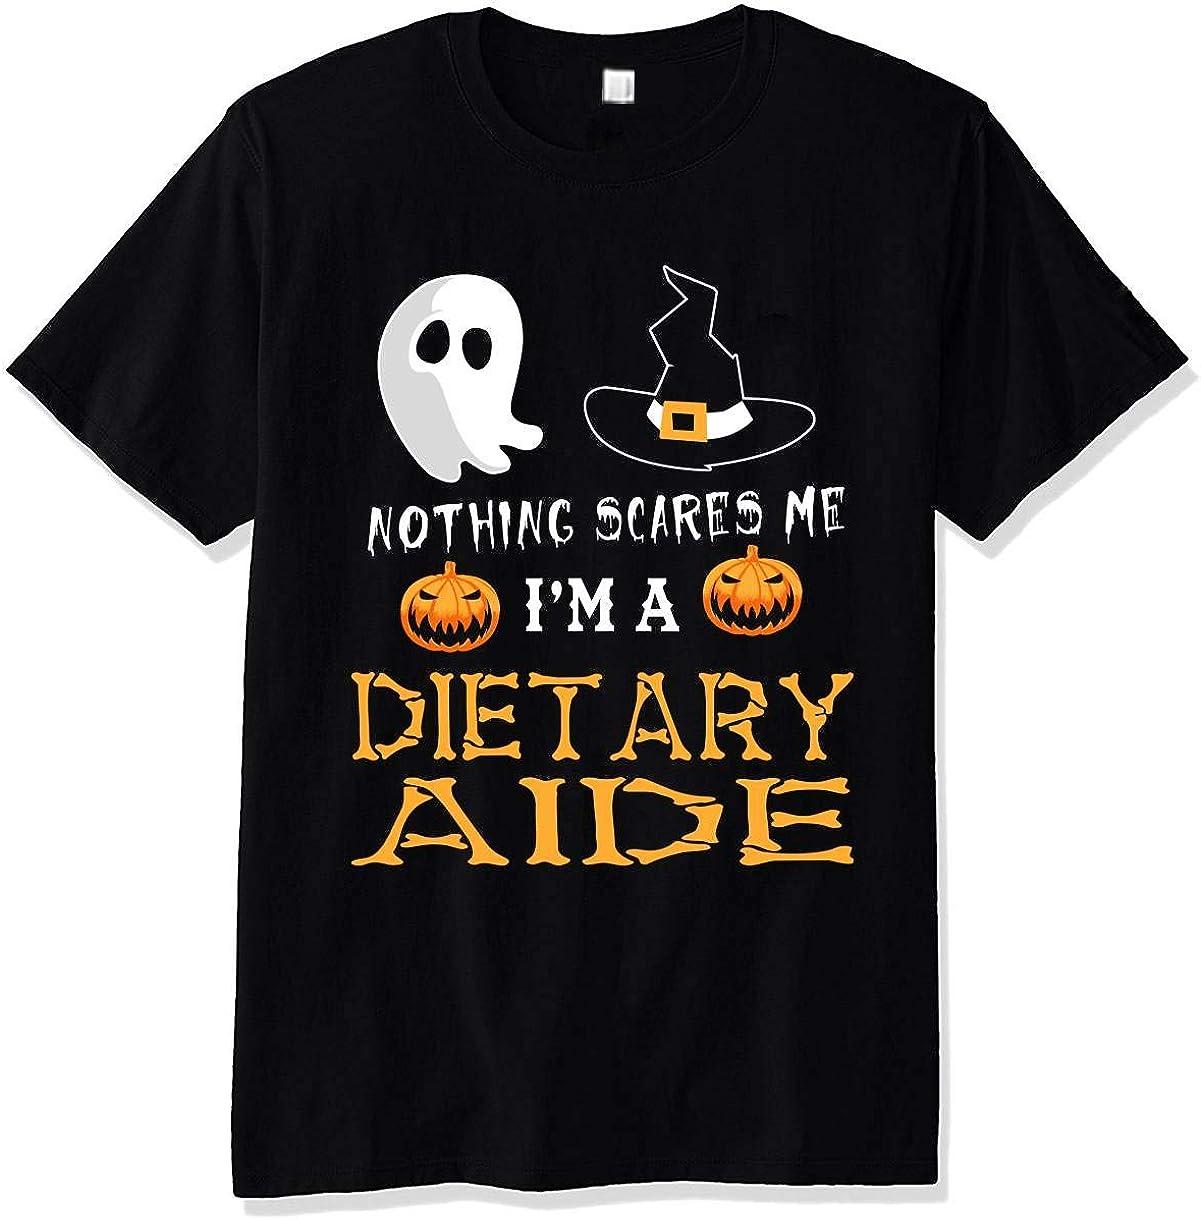 Halloween shirts UNISEX